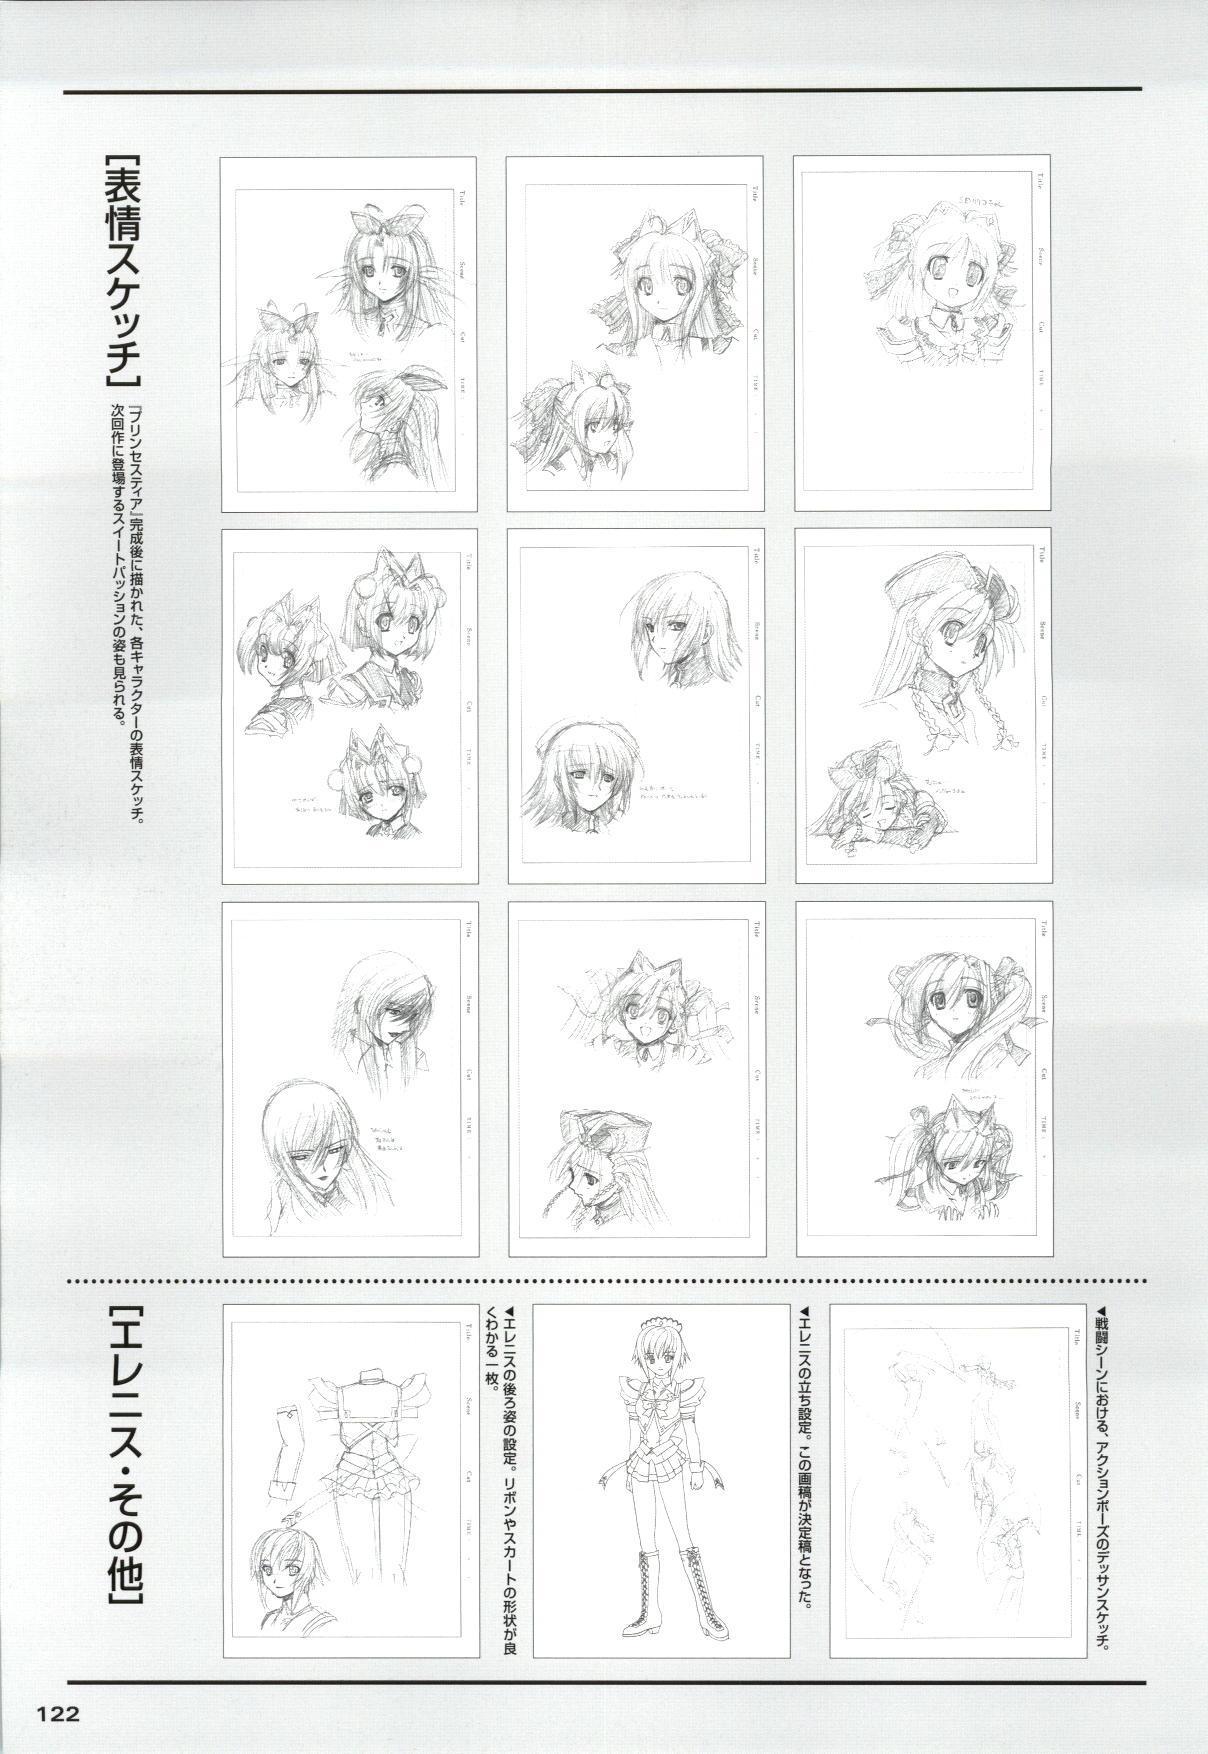 Mahou Senshi Sweet Knight & Mahou Senshi Princess Tear 121